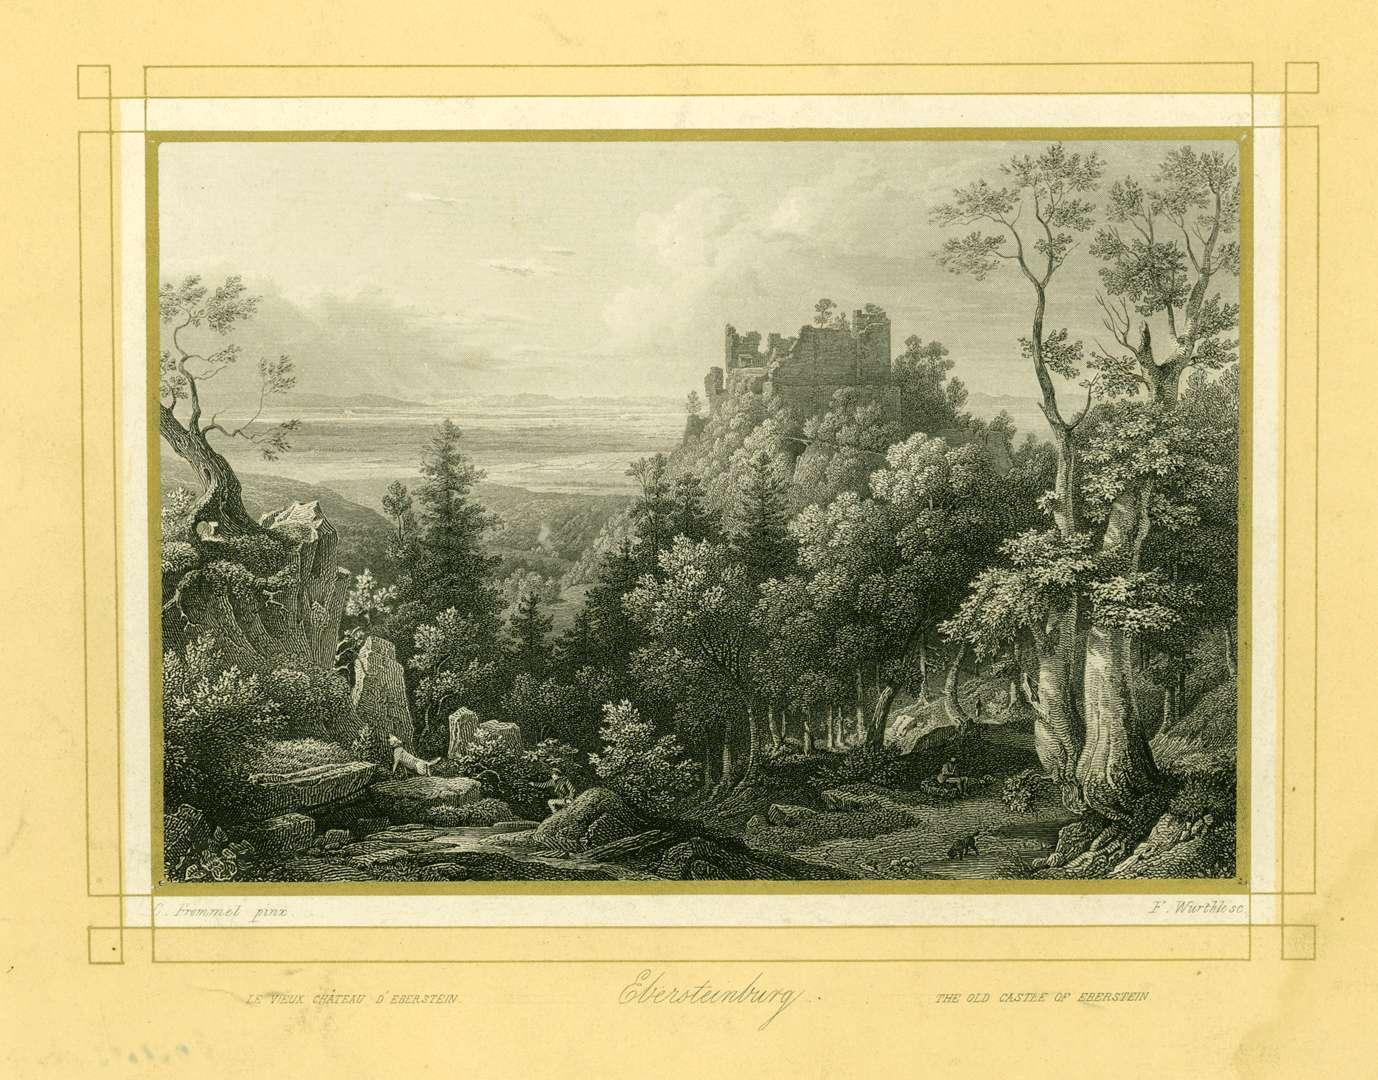 Ebersteinburg, vieux château d